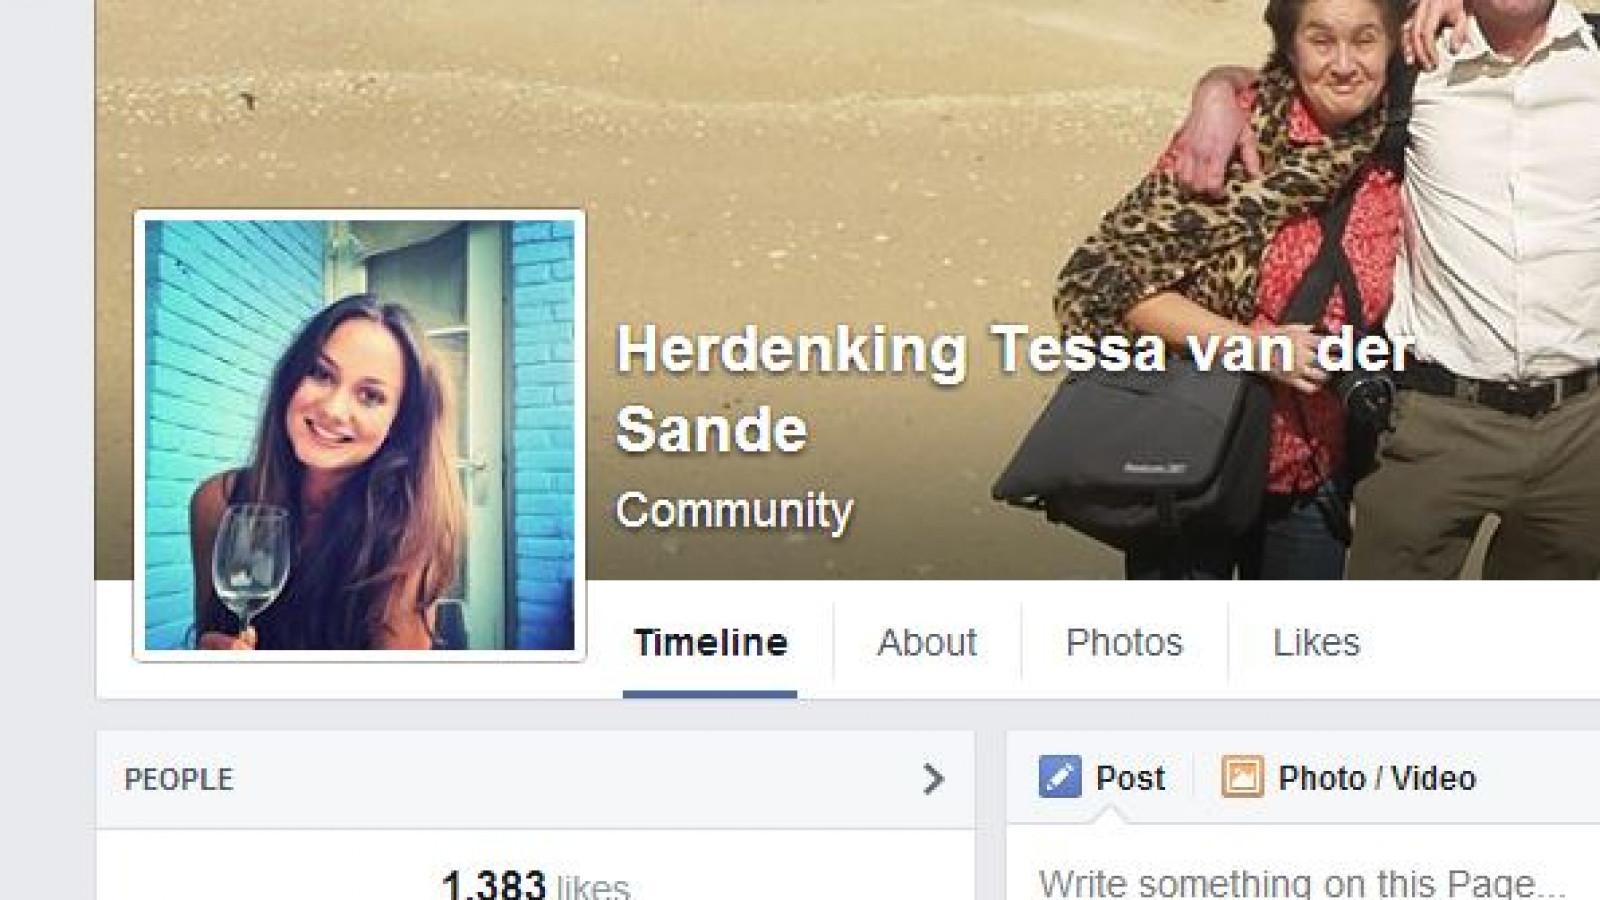 Facebook / Herdenking Tessa van der Sande